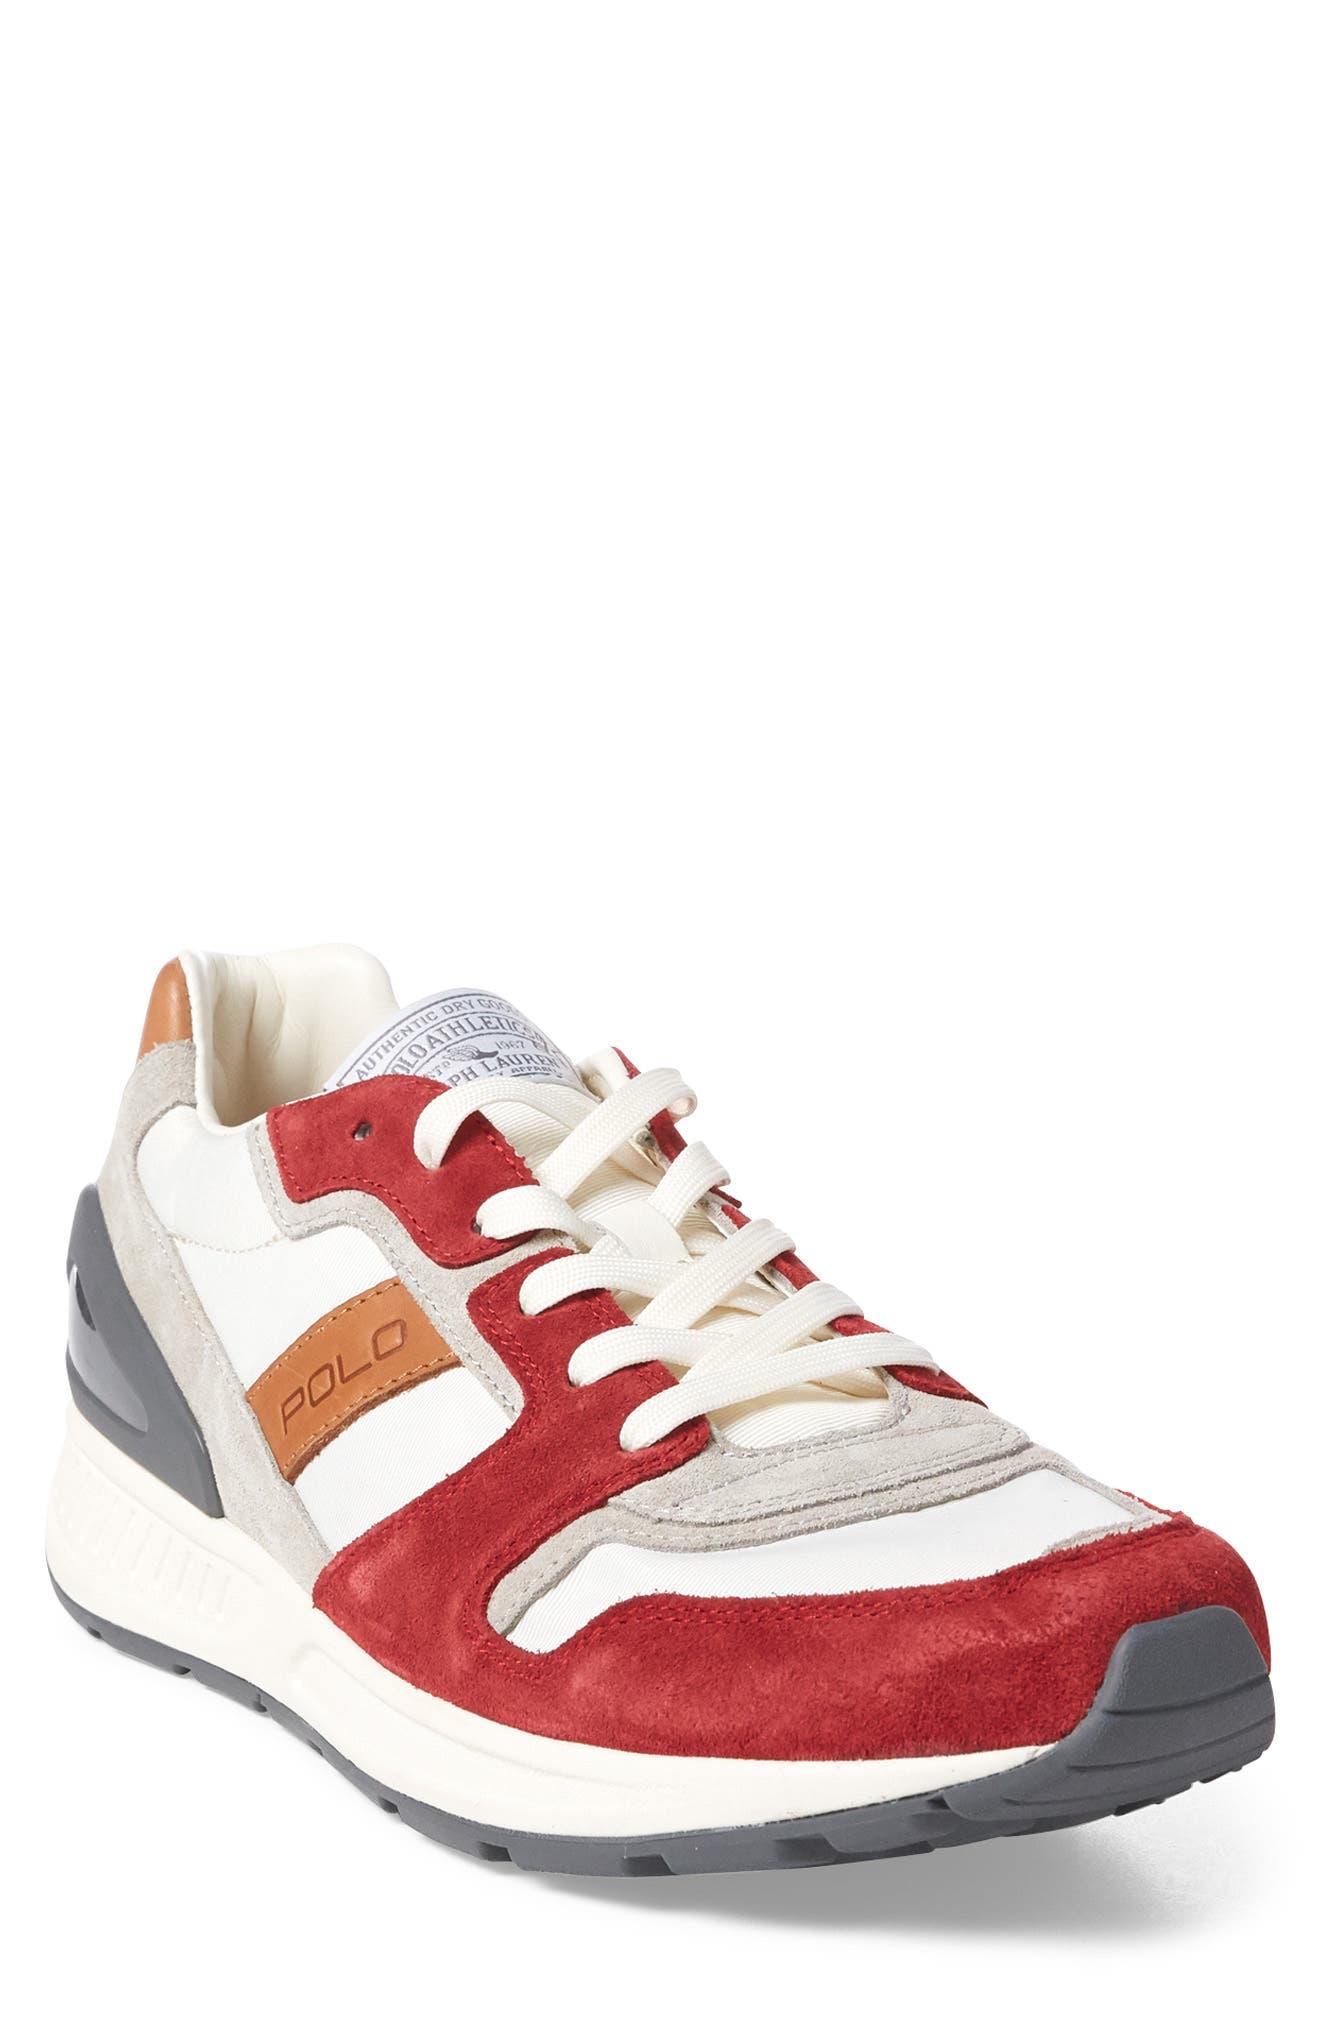 Train 100 Retro Sneaker,                             Main thumbnail 1, color,                             RED NYLON/ SUEDE